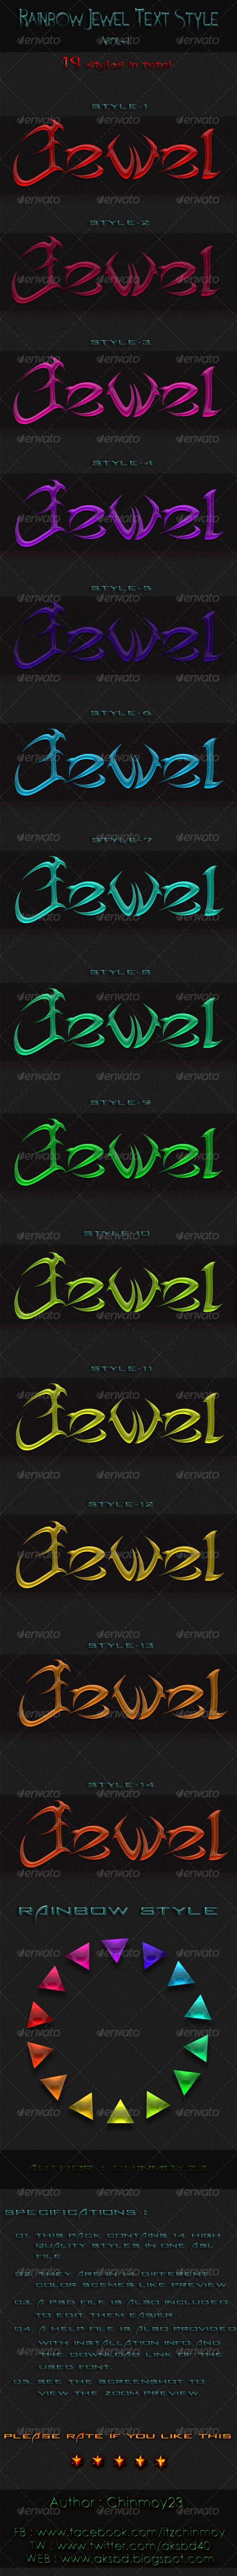 GraphicRiver Rainbow Jewel Text Style Vol-1 6513267